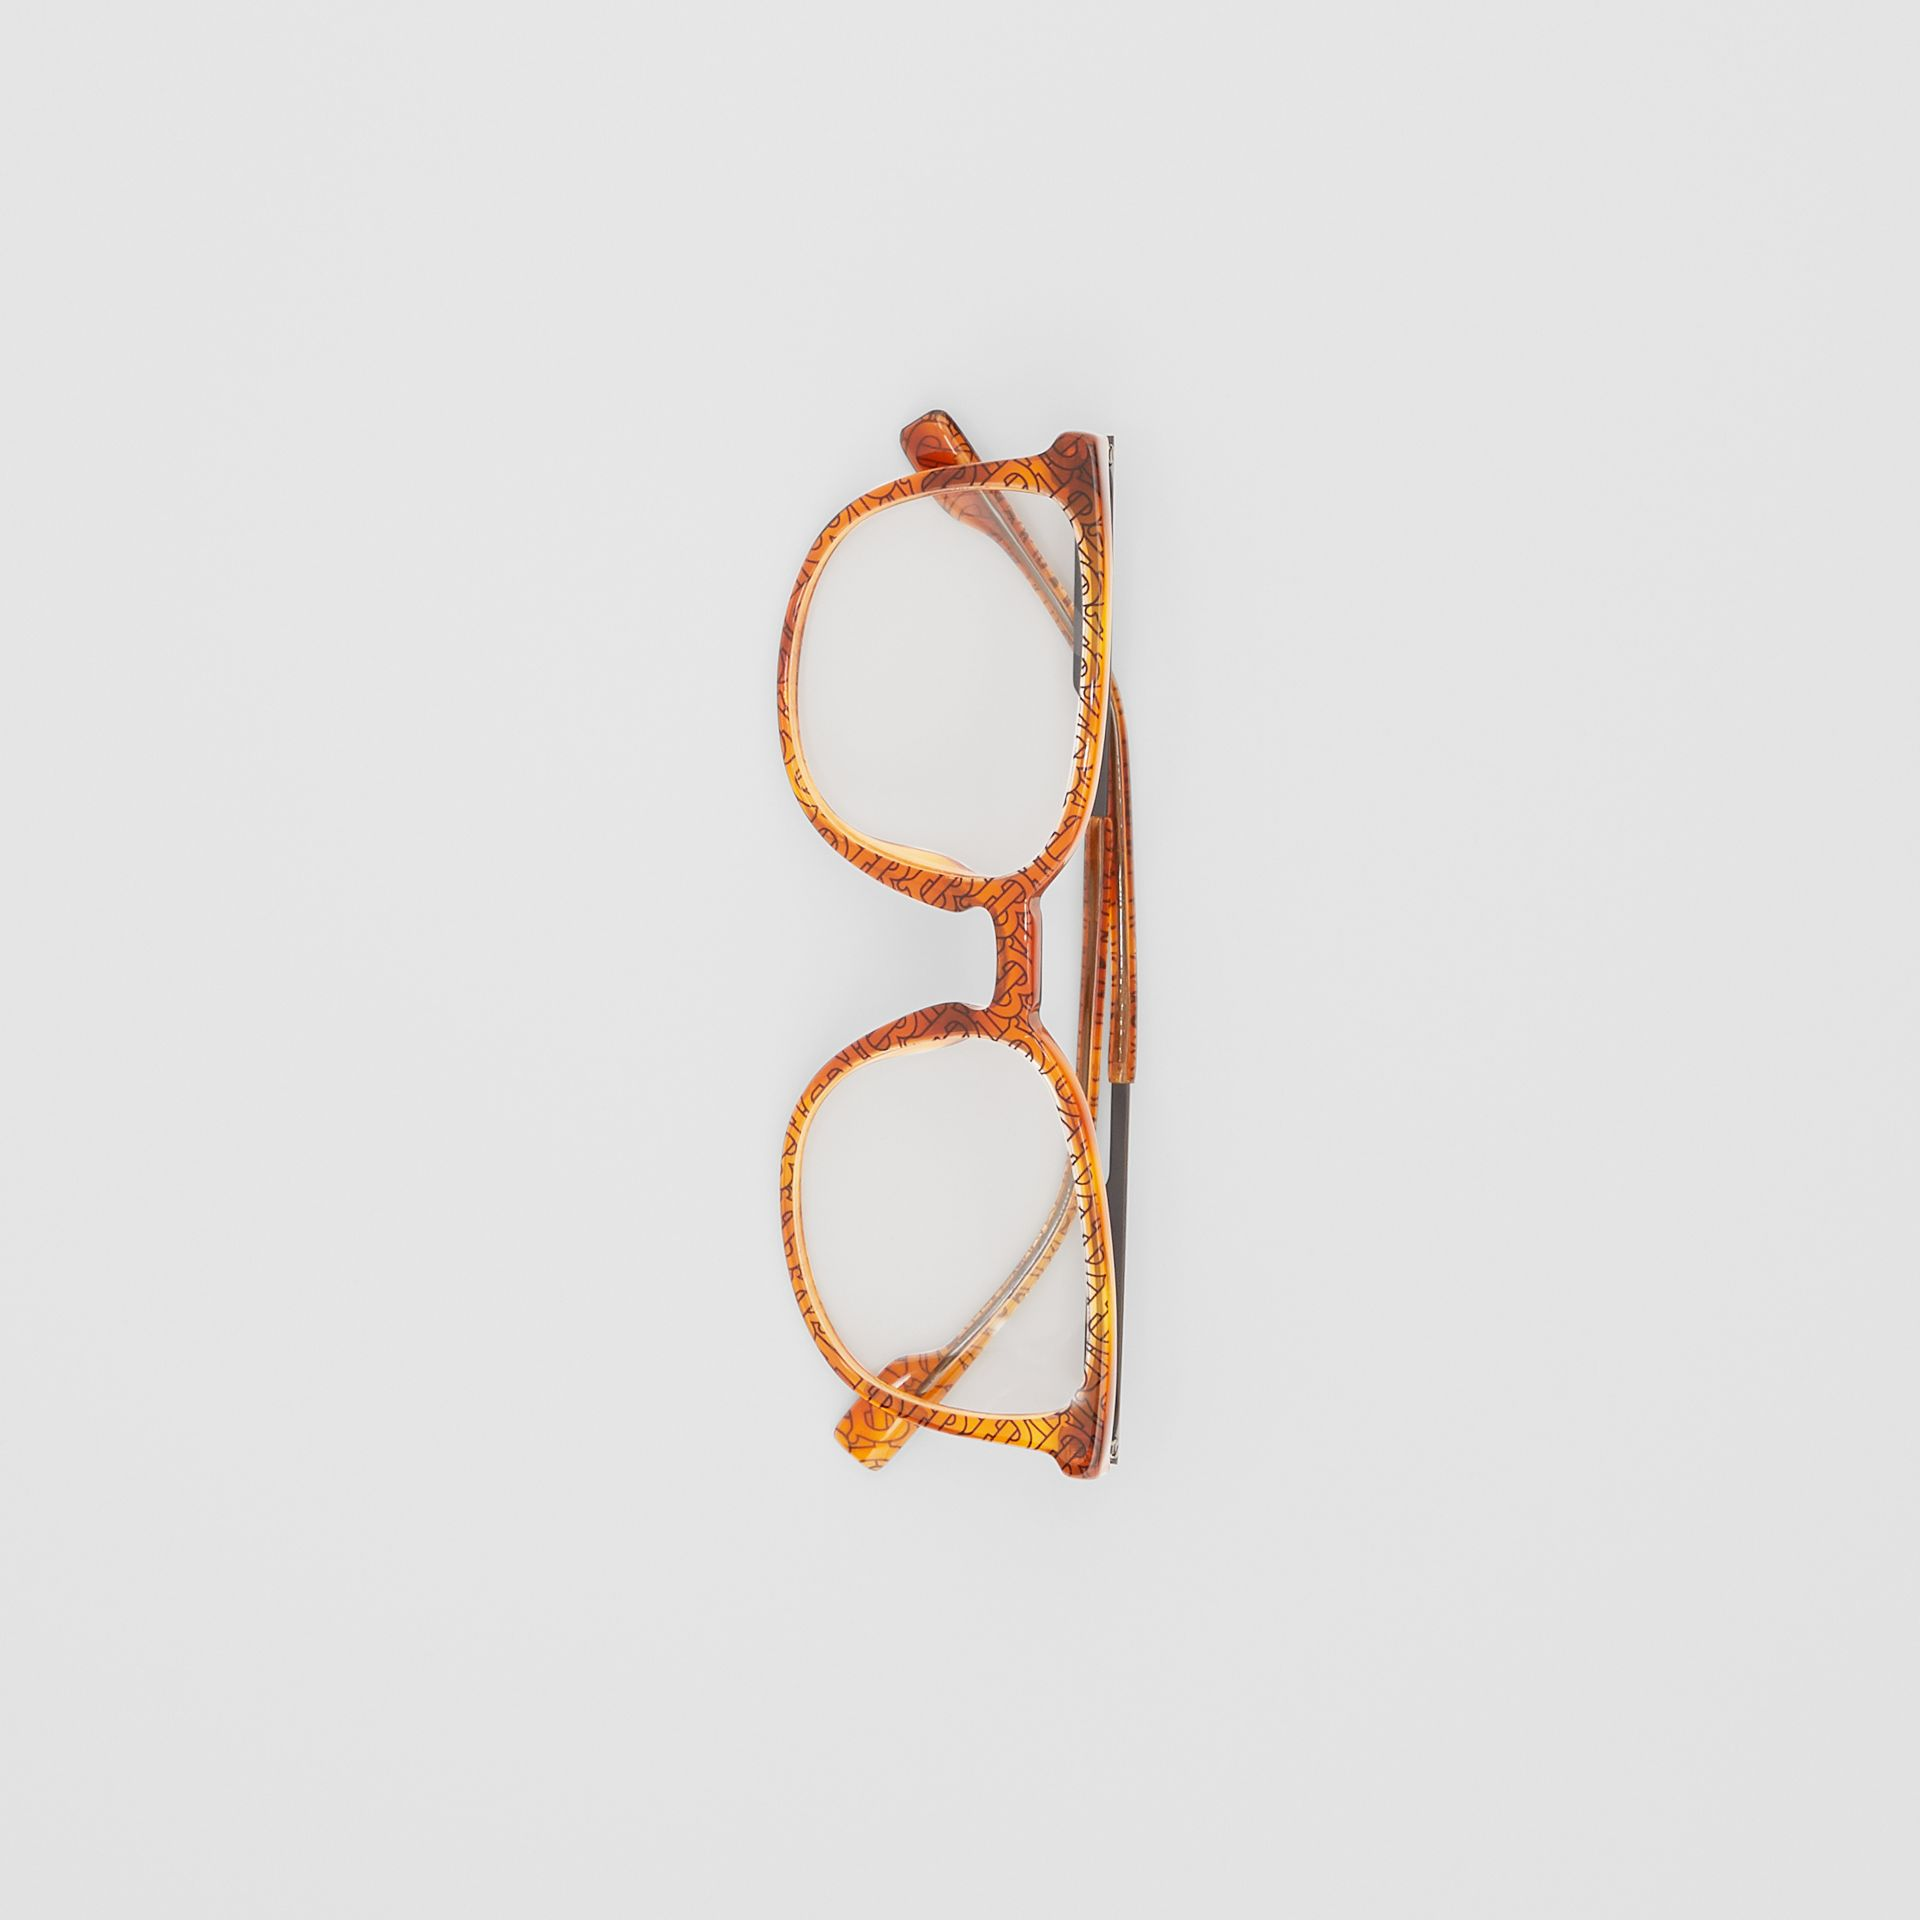 Monogram Print Square Optical Frames in Tortoiseshell Amber | Burberry Canada - gallery image 2